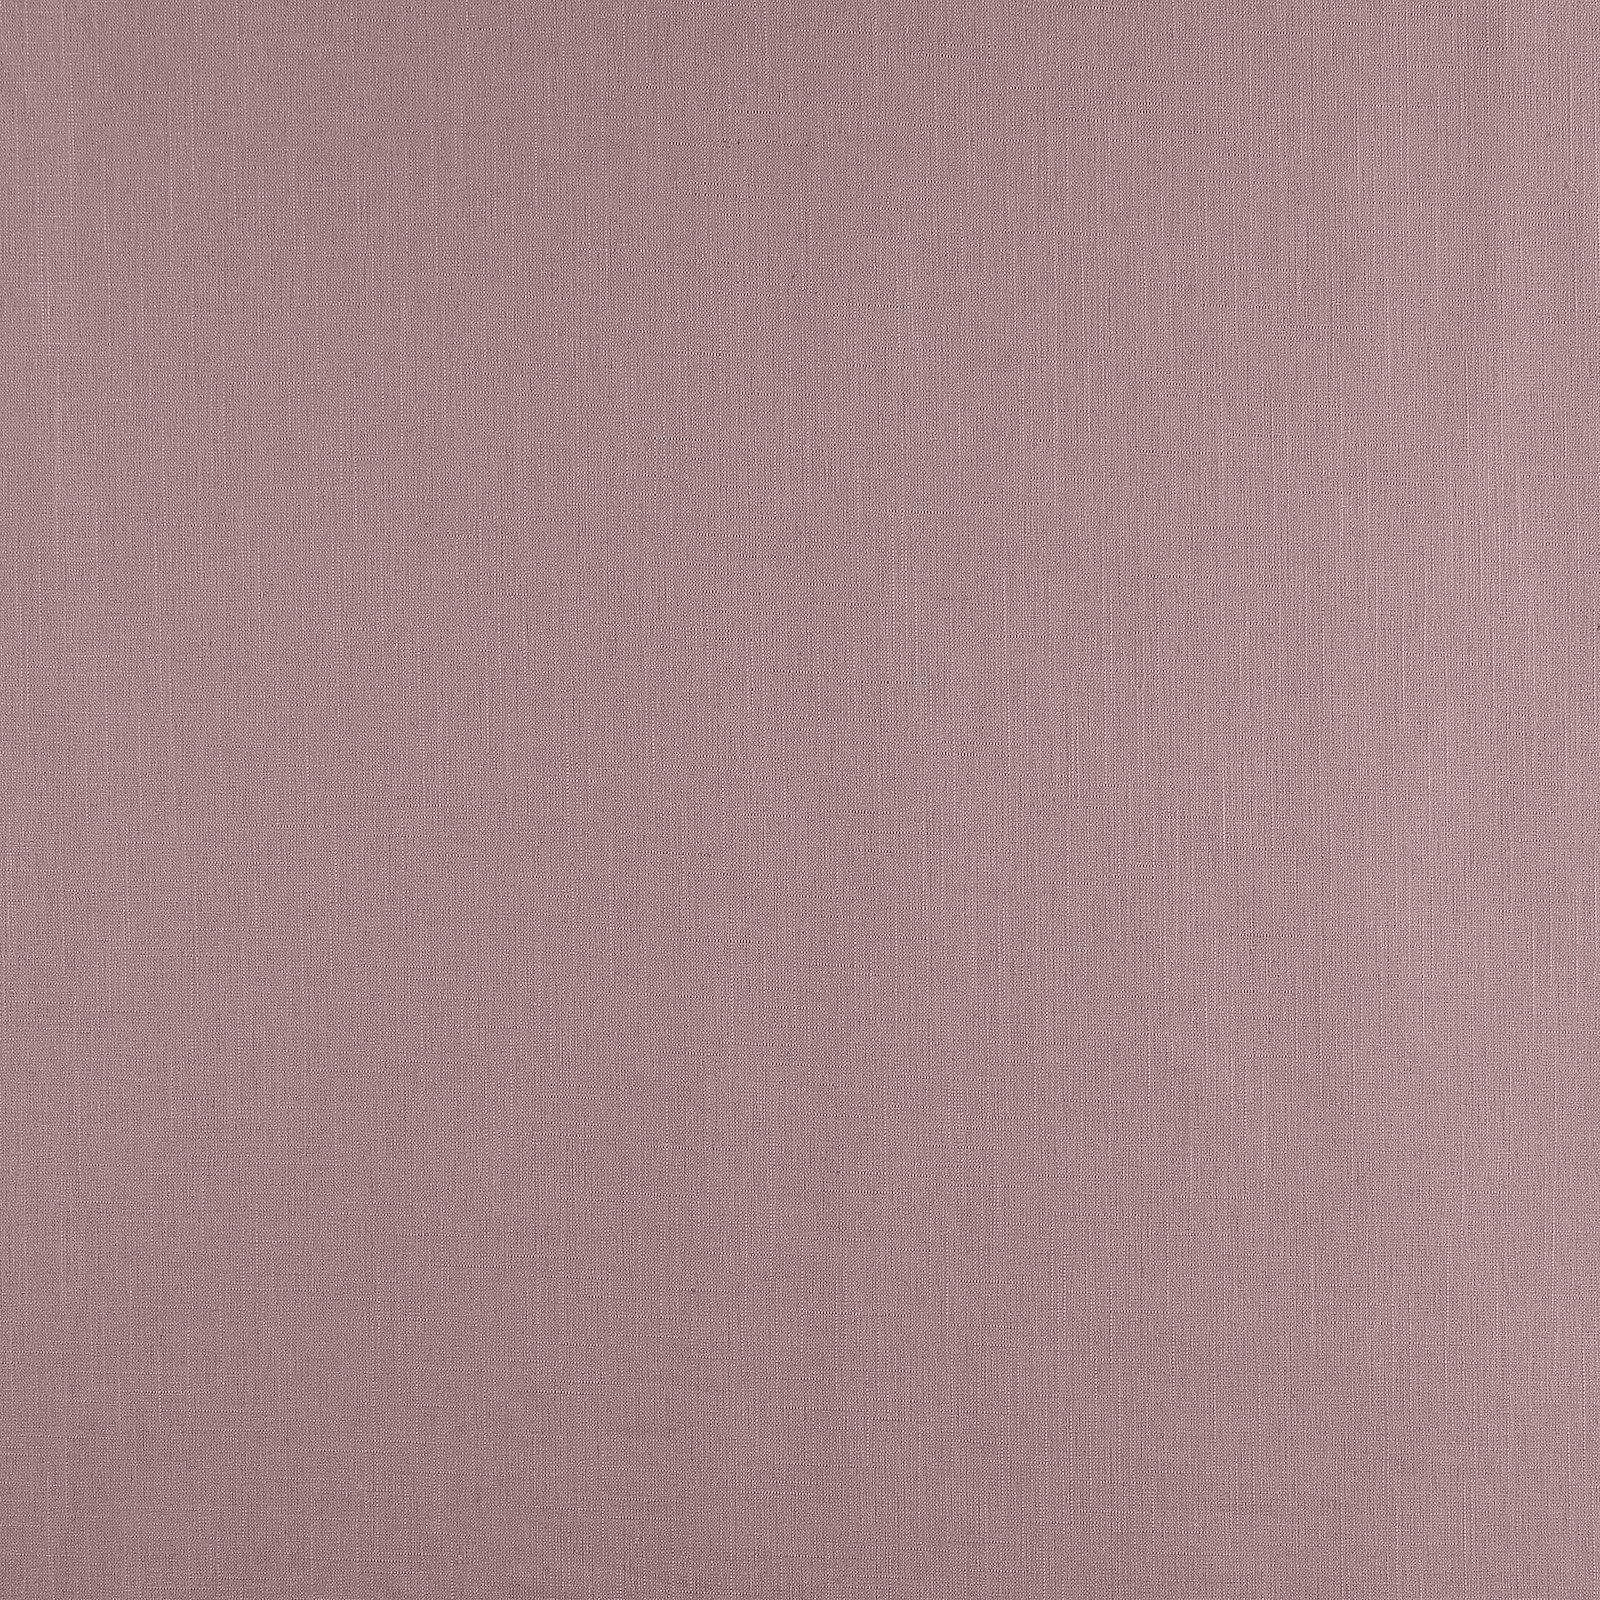 Coarse linen/viscose purple 852391_pack_solid